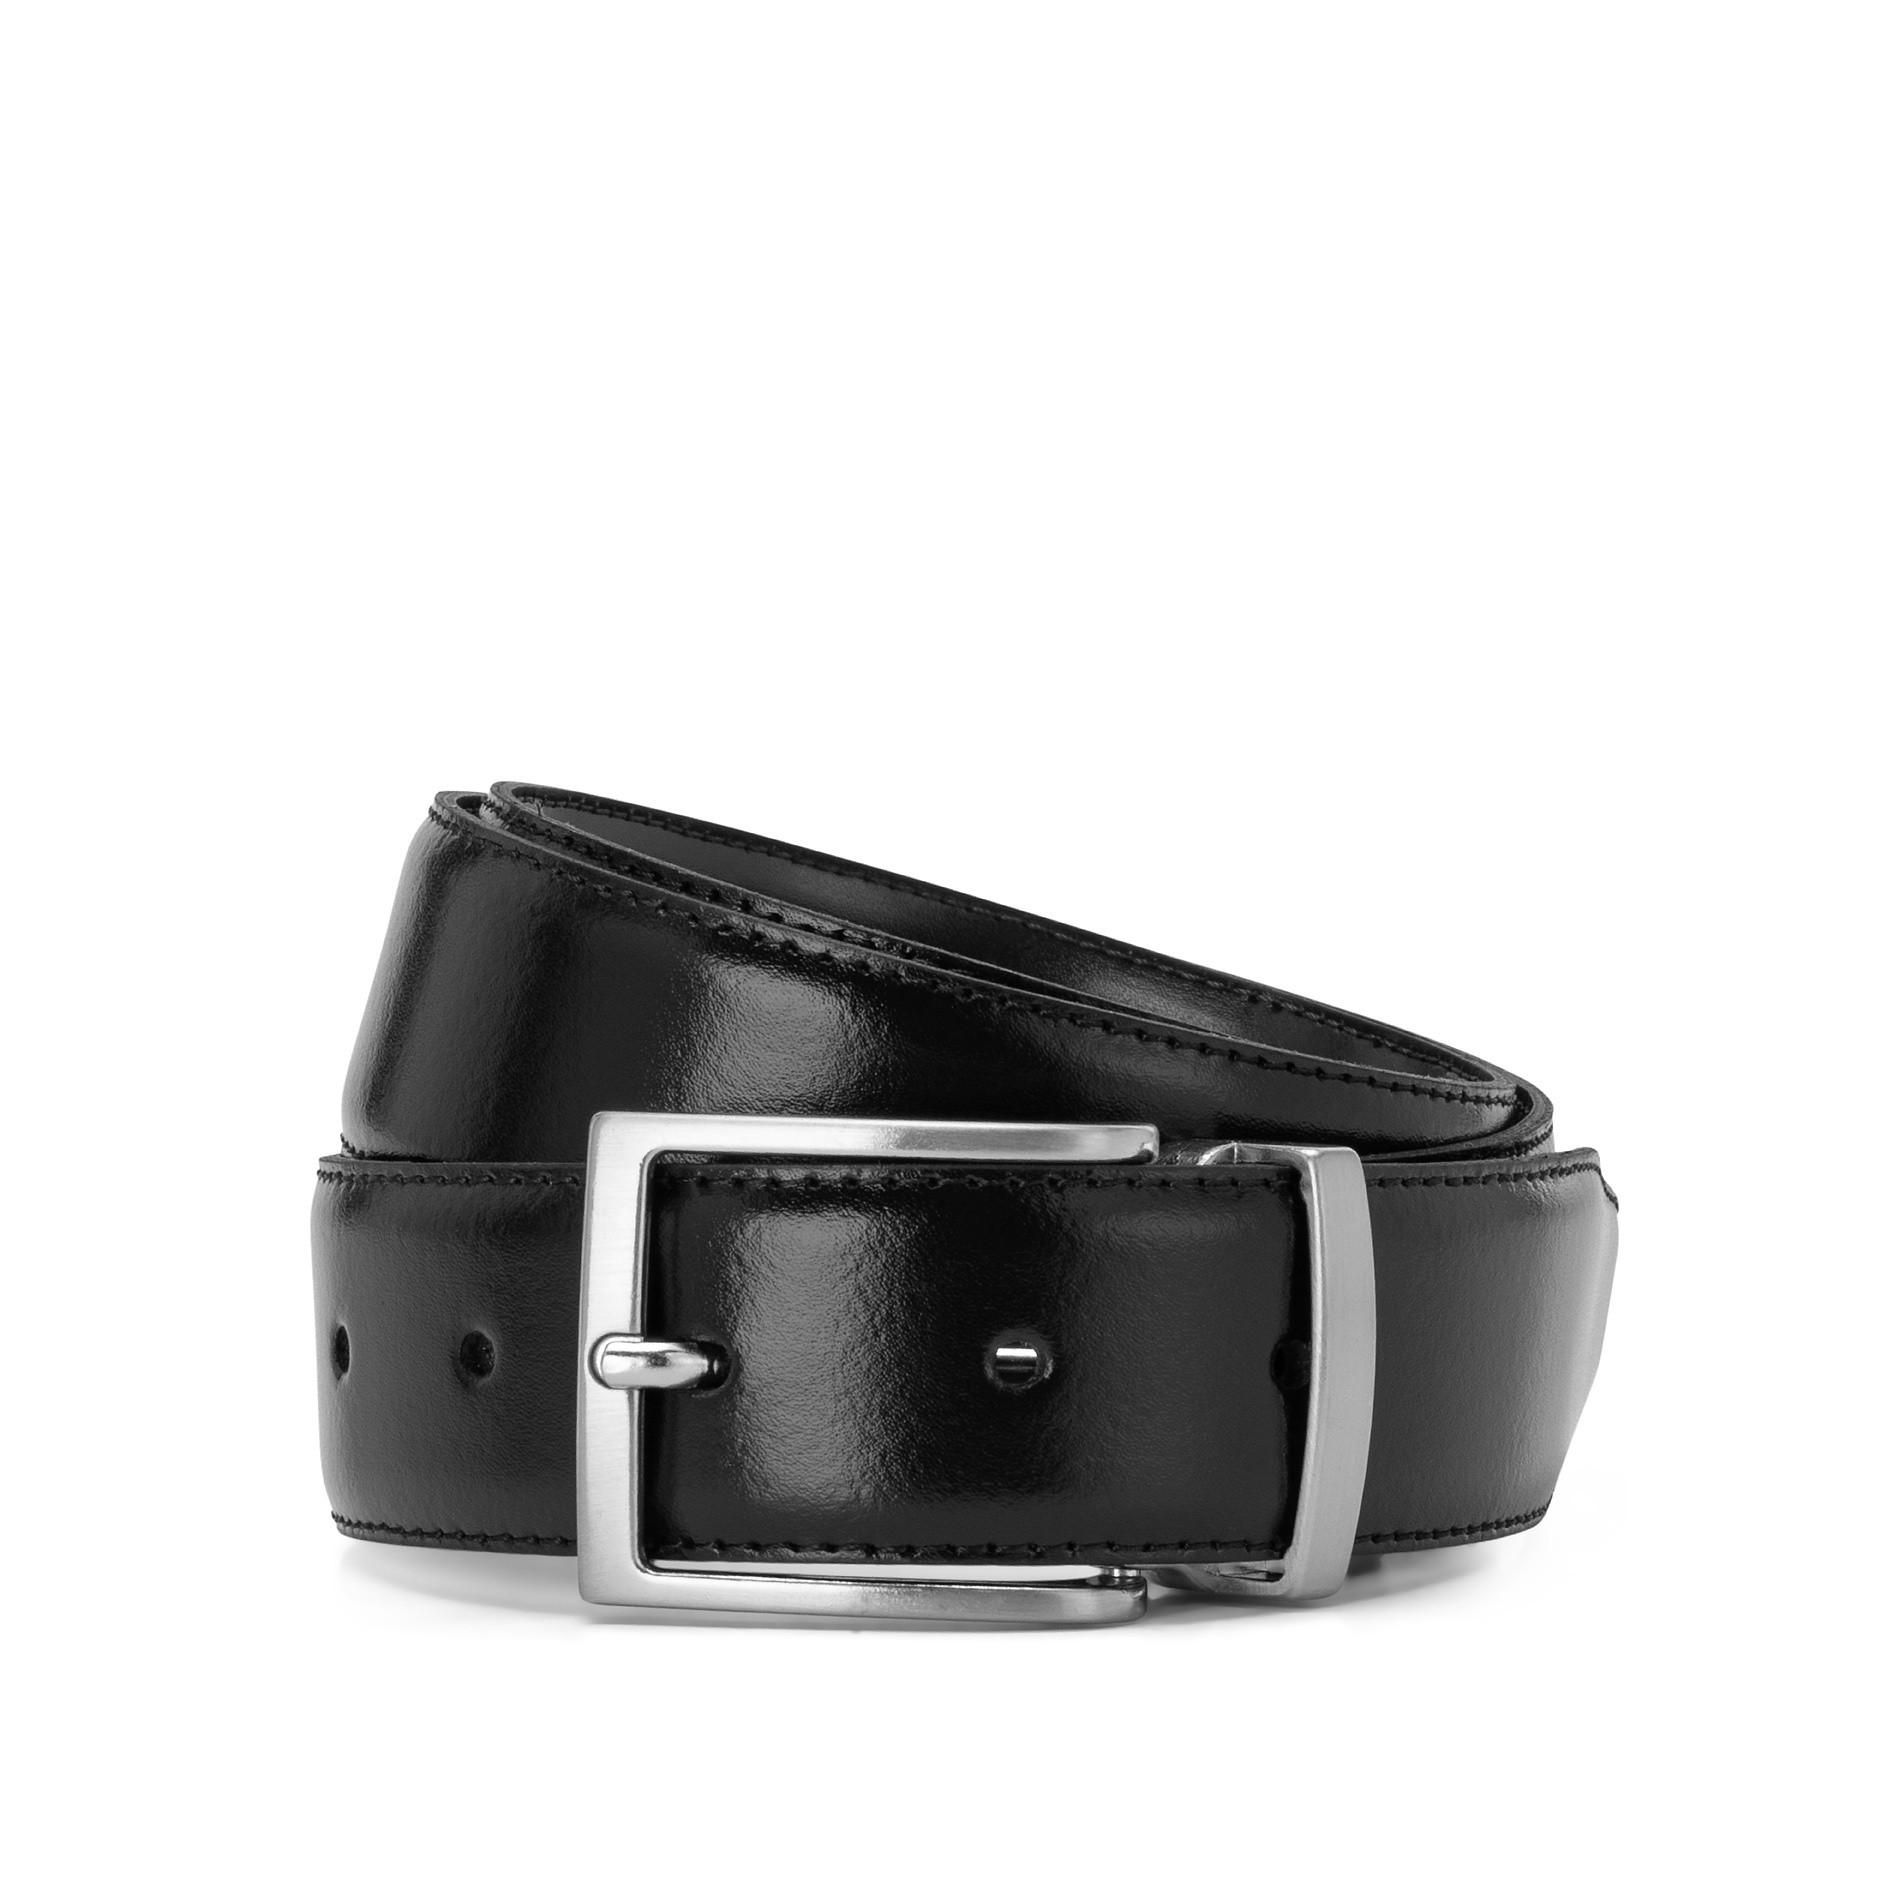 Cintura in vera pelle, Nero, large image number 0